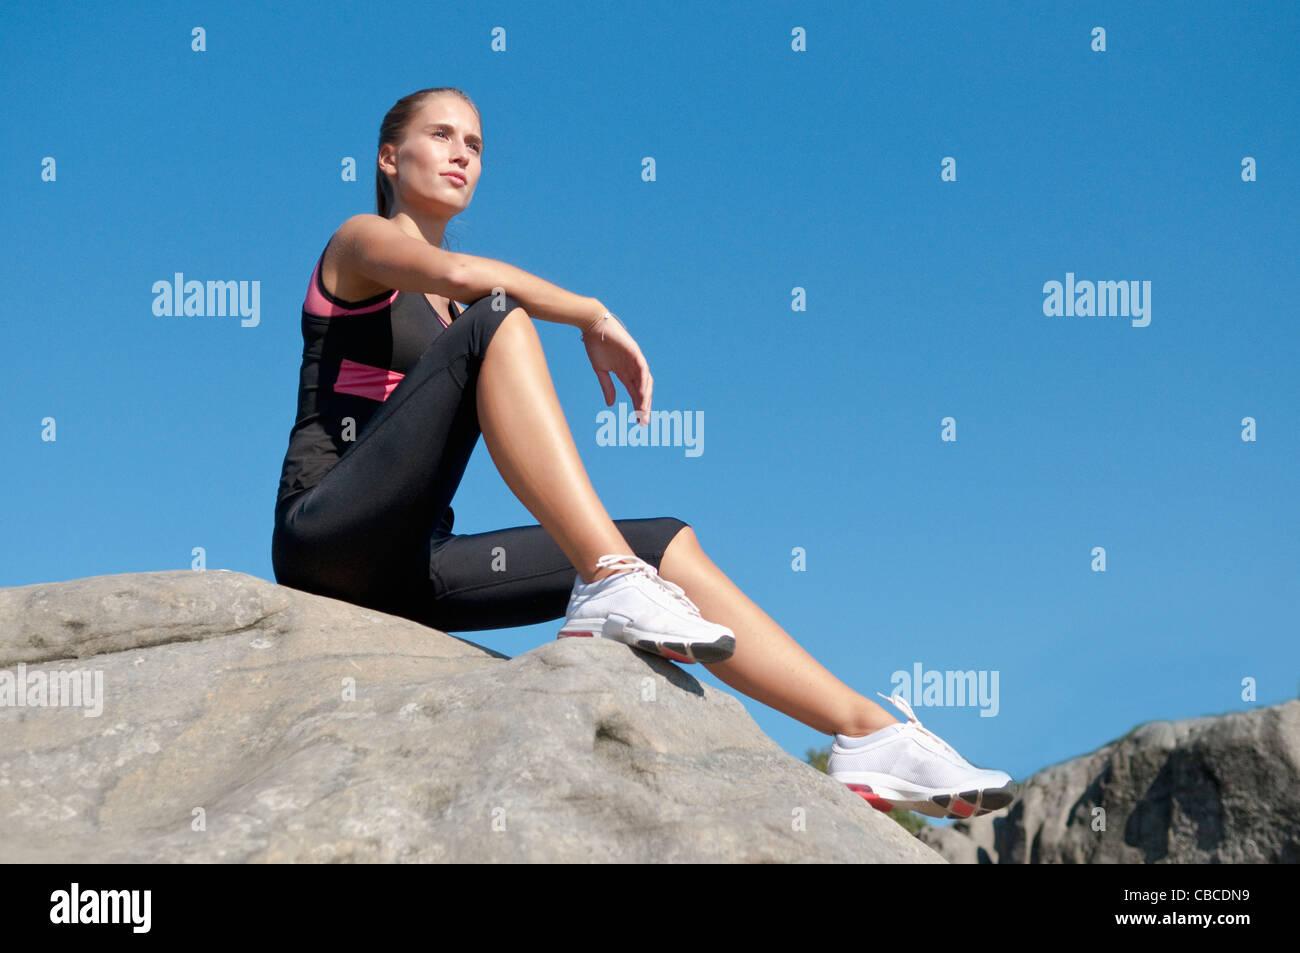 Rock climber resting on boulder - Stock Image